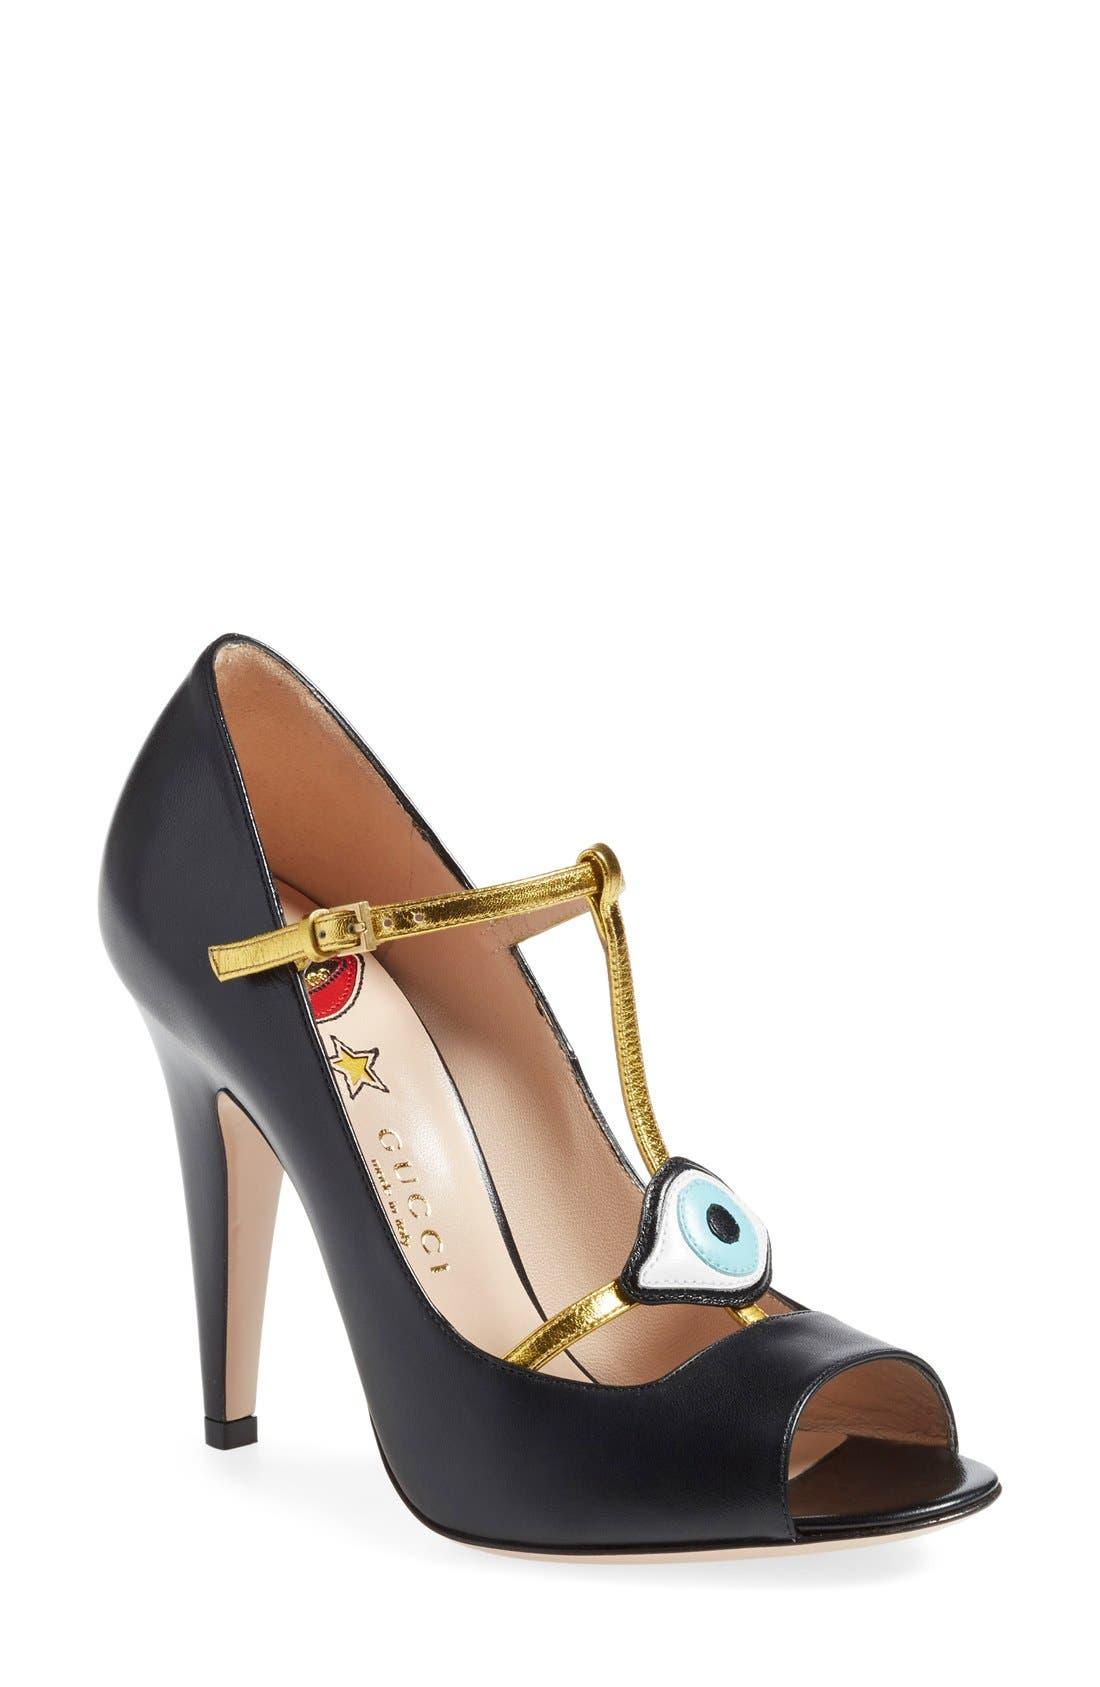 Main Image - Gucci 'Molina' T-Strap Peep Toe Pump (Women)